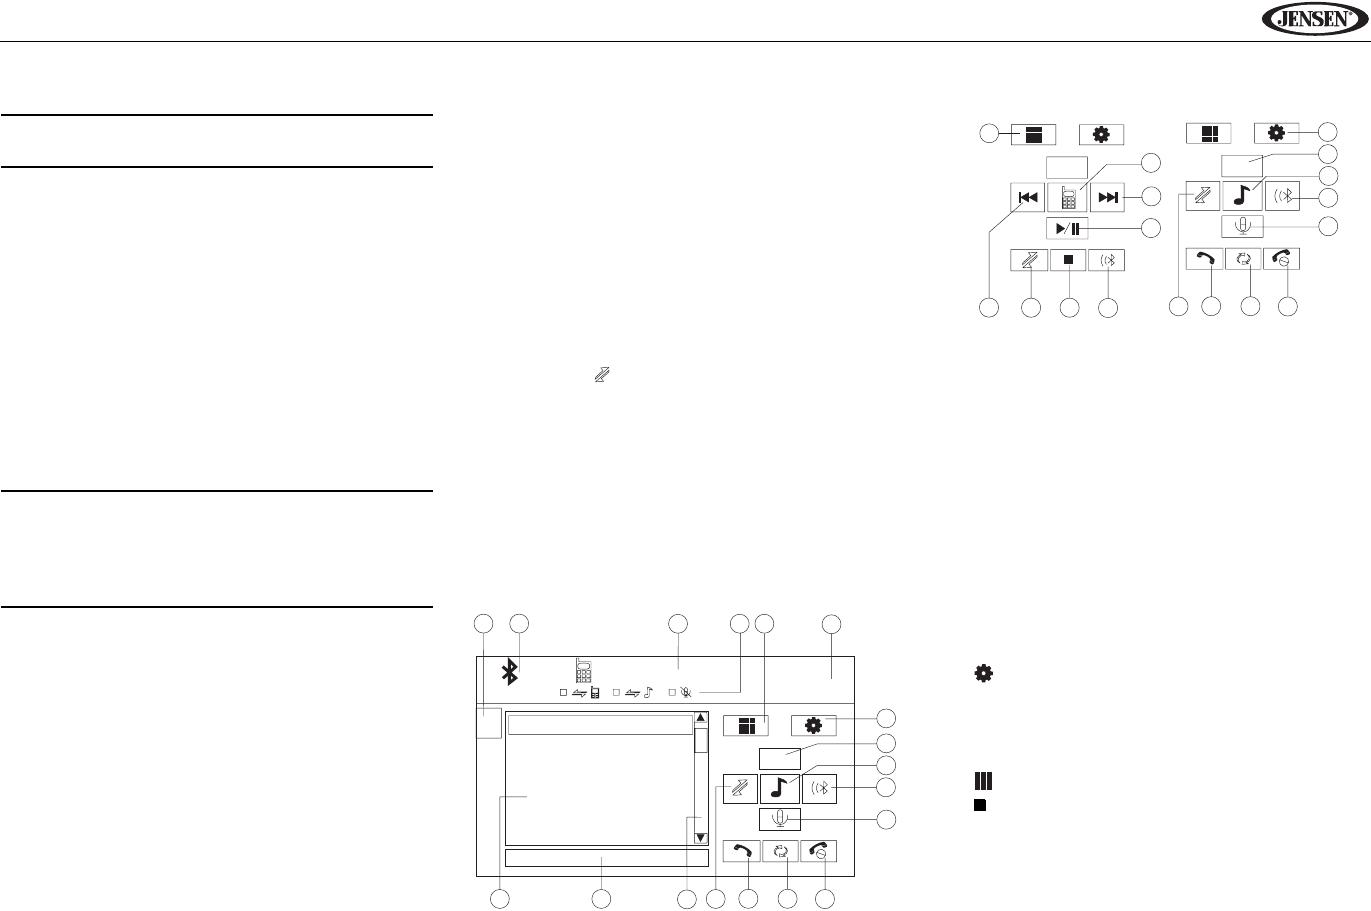 Jensen Phase Linear Uv10 Wiring Diagram